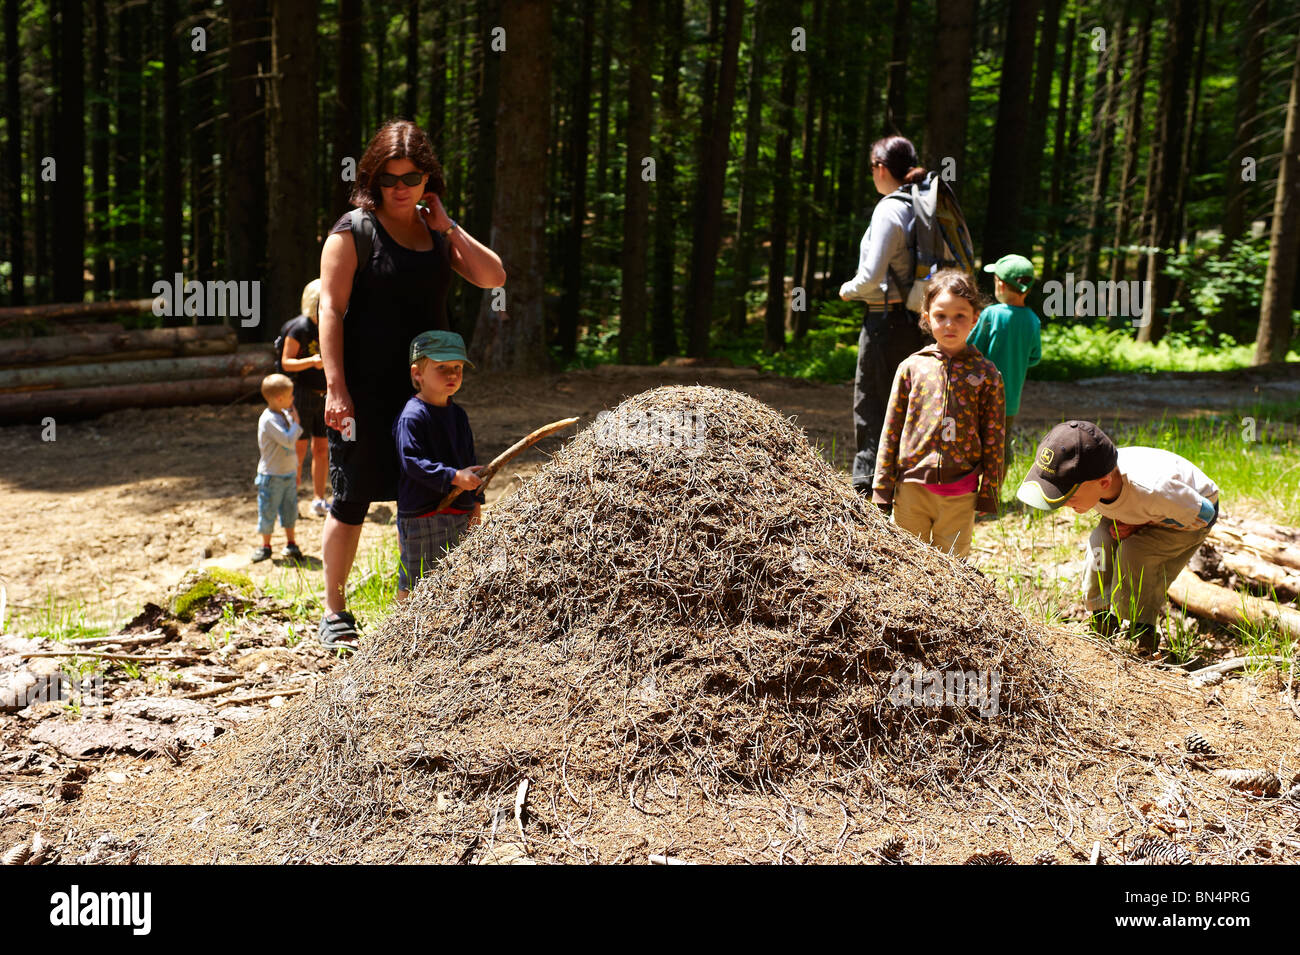 Children looking and examining Anthill, ants colony, Spicak hill, Zelezna Ruda, NP Sumava, Ceska republika - Stock Image